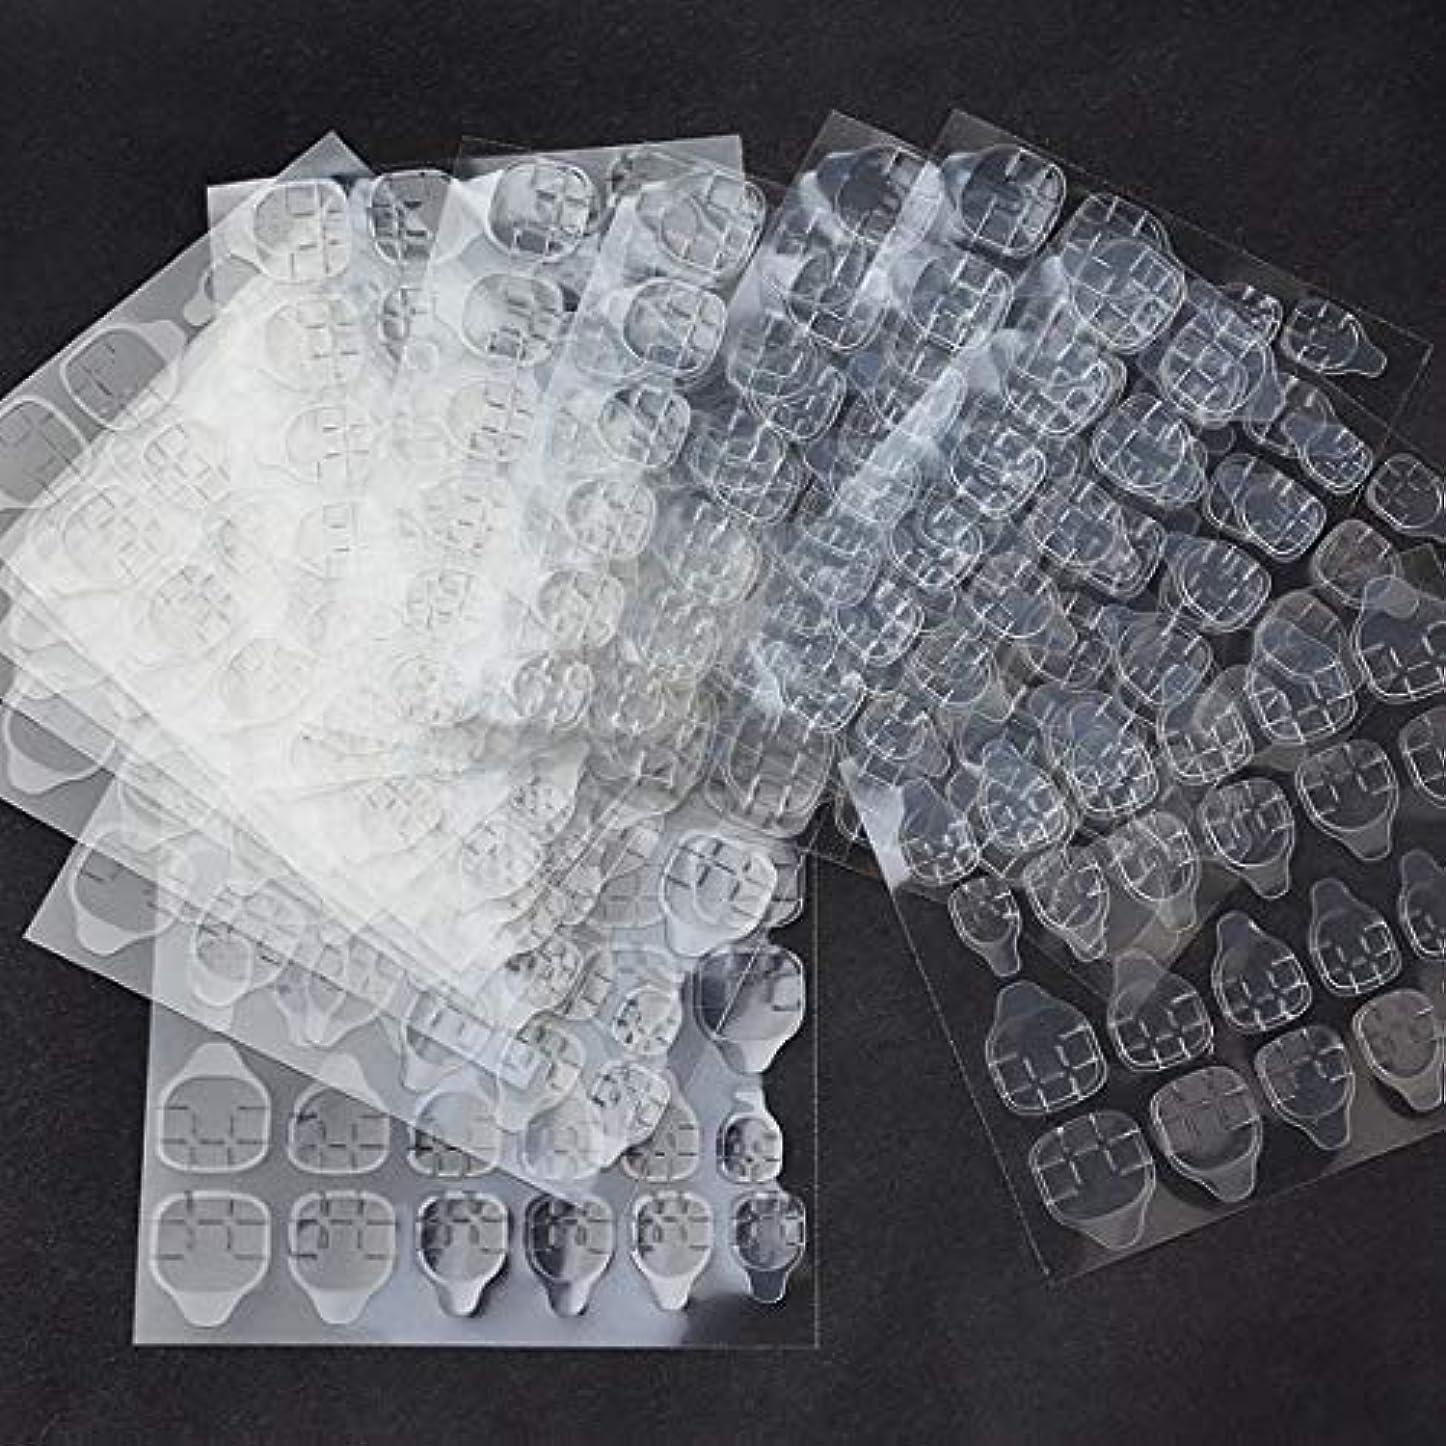 Tianmey 10枚防水通気性透明超薄型両面接着タブネイルグルーステッカー偽ネイルのヒント